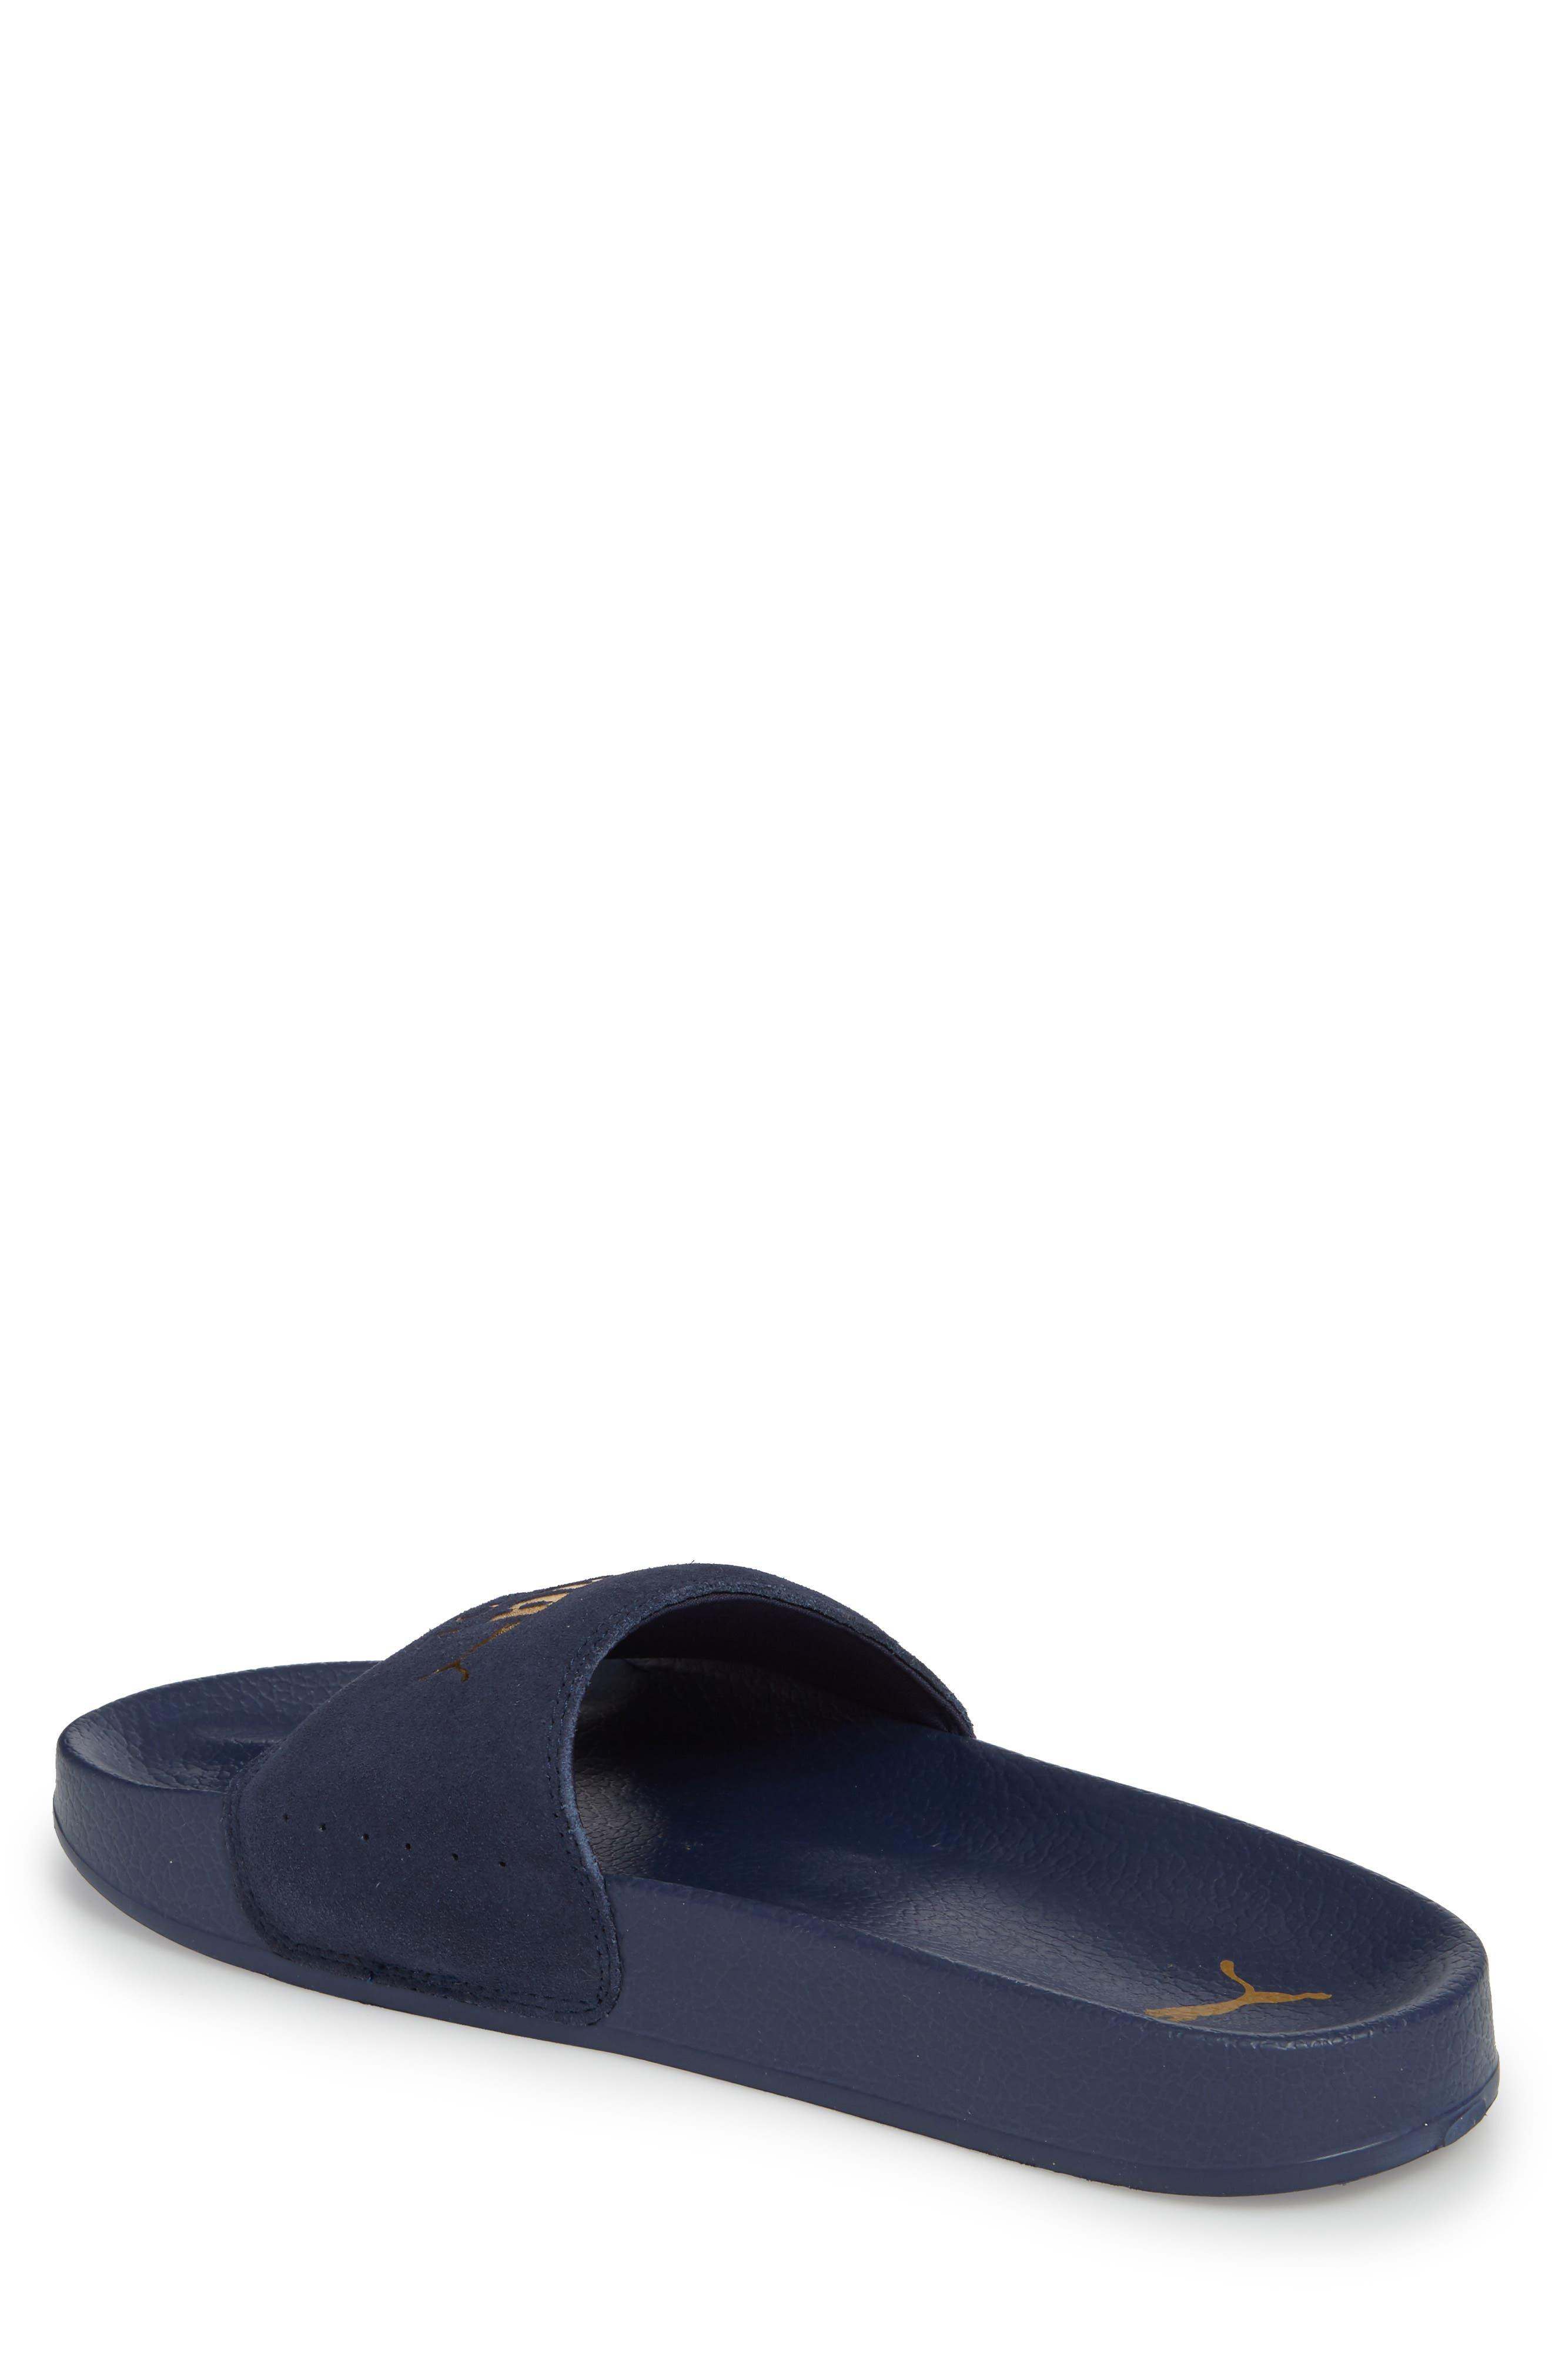 Leadcat Suede Slide Sandal,                             Alternate thumbnail 2, color,                             Peacoat/ Gold Leather/ Suede